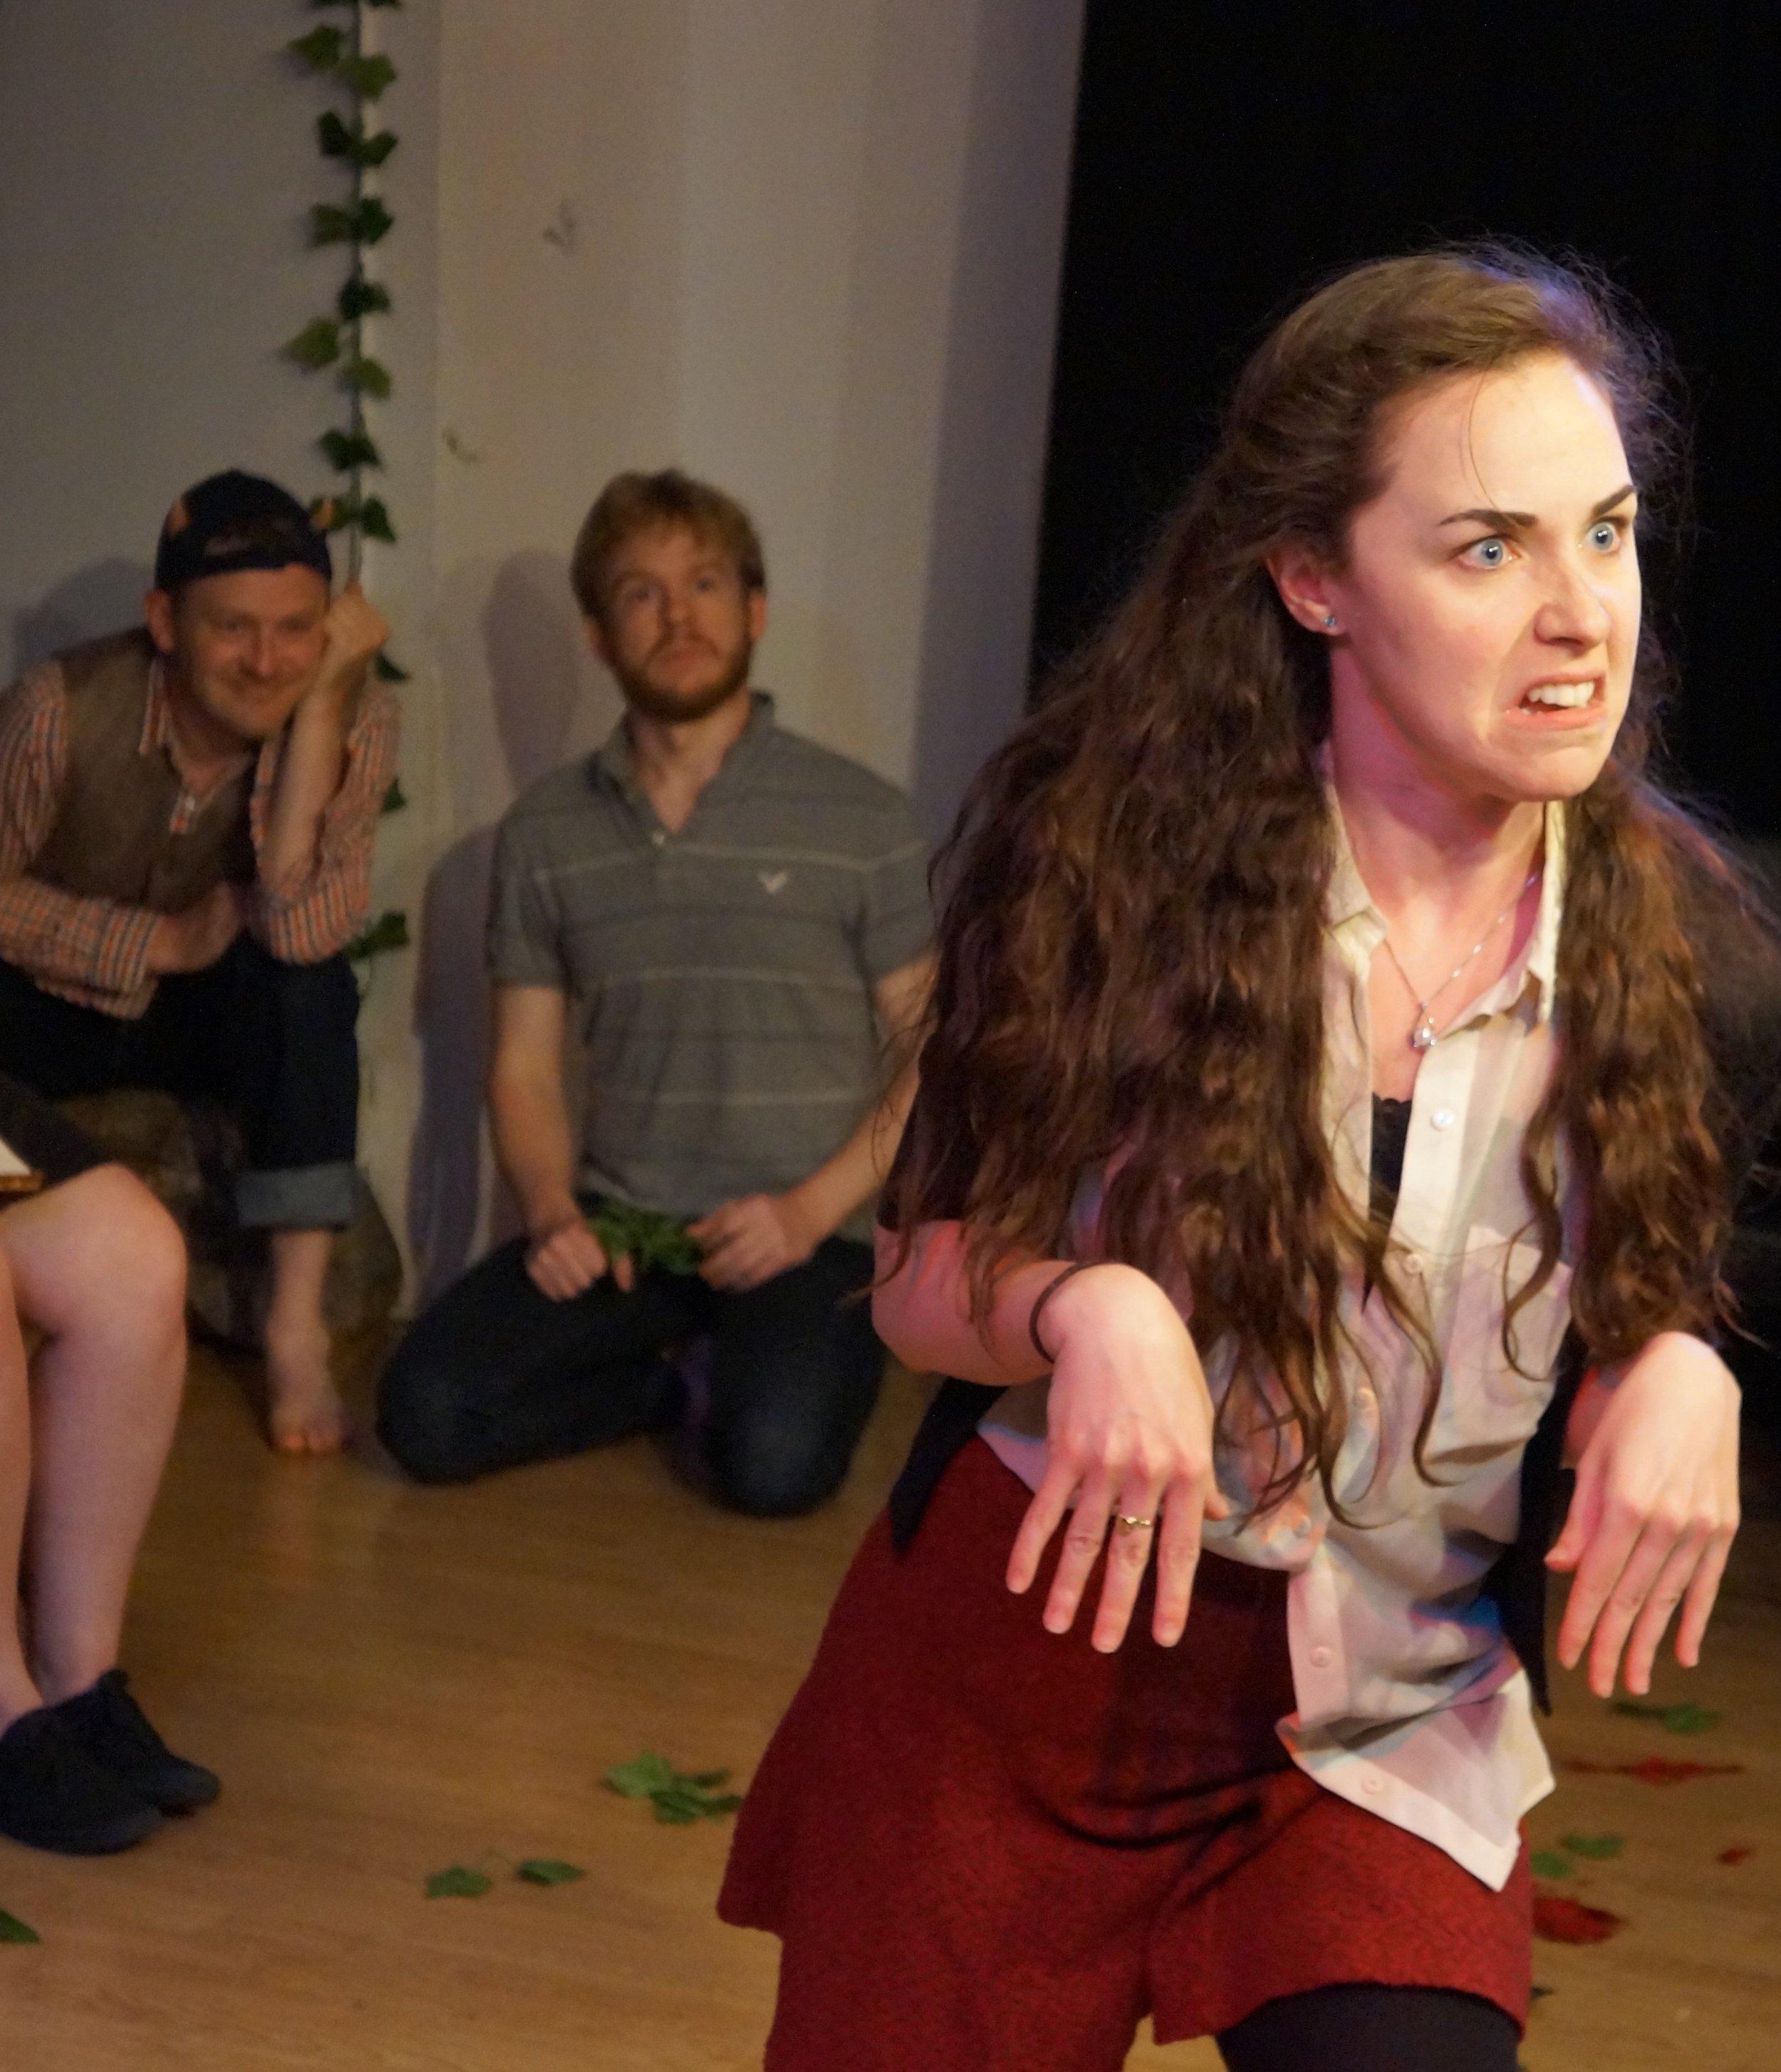 Rhys McClelland, Kevin Percival, and Megan Greener(1).jpg